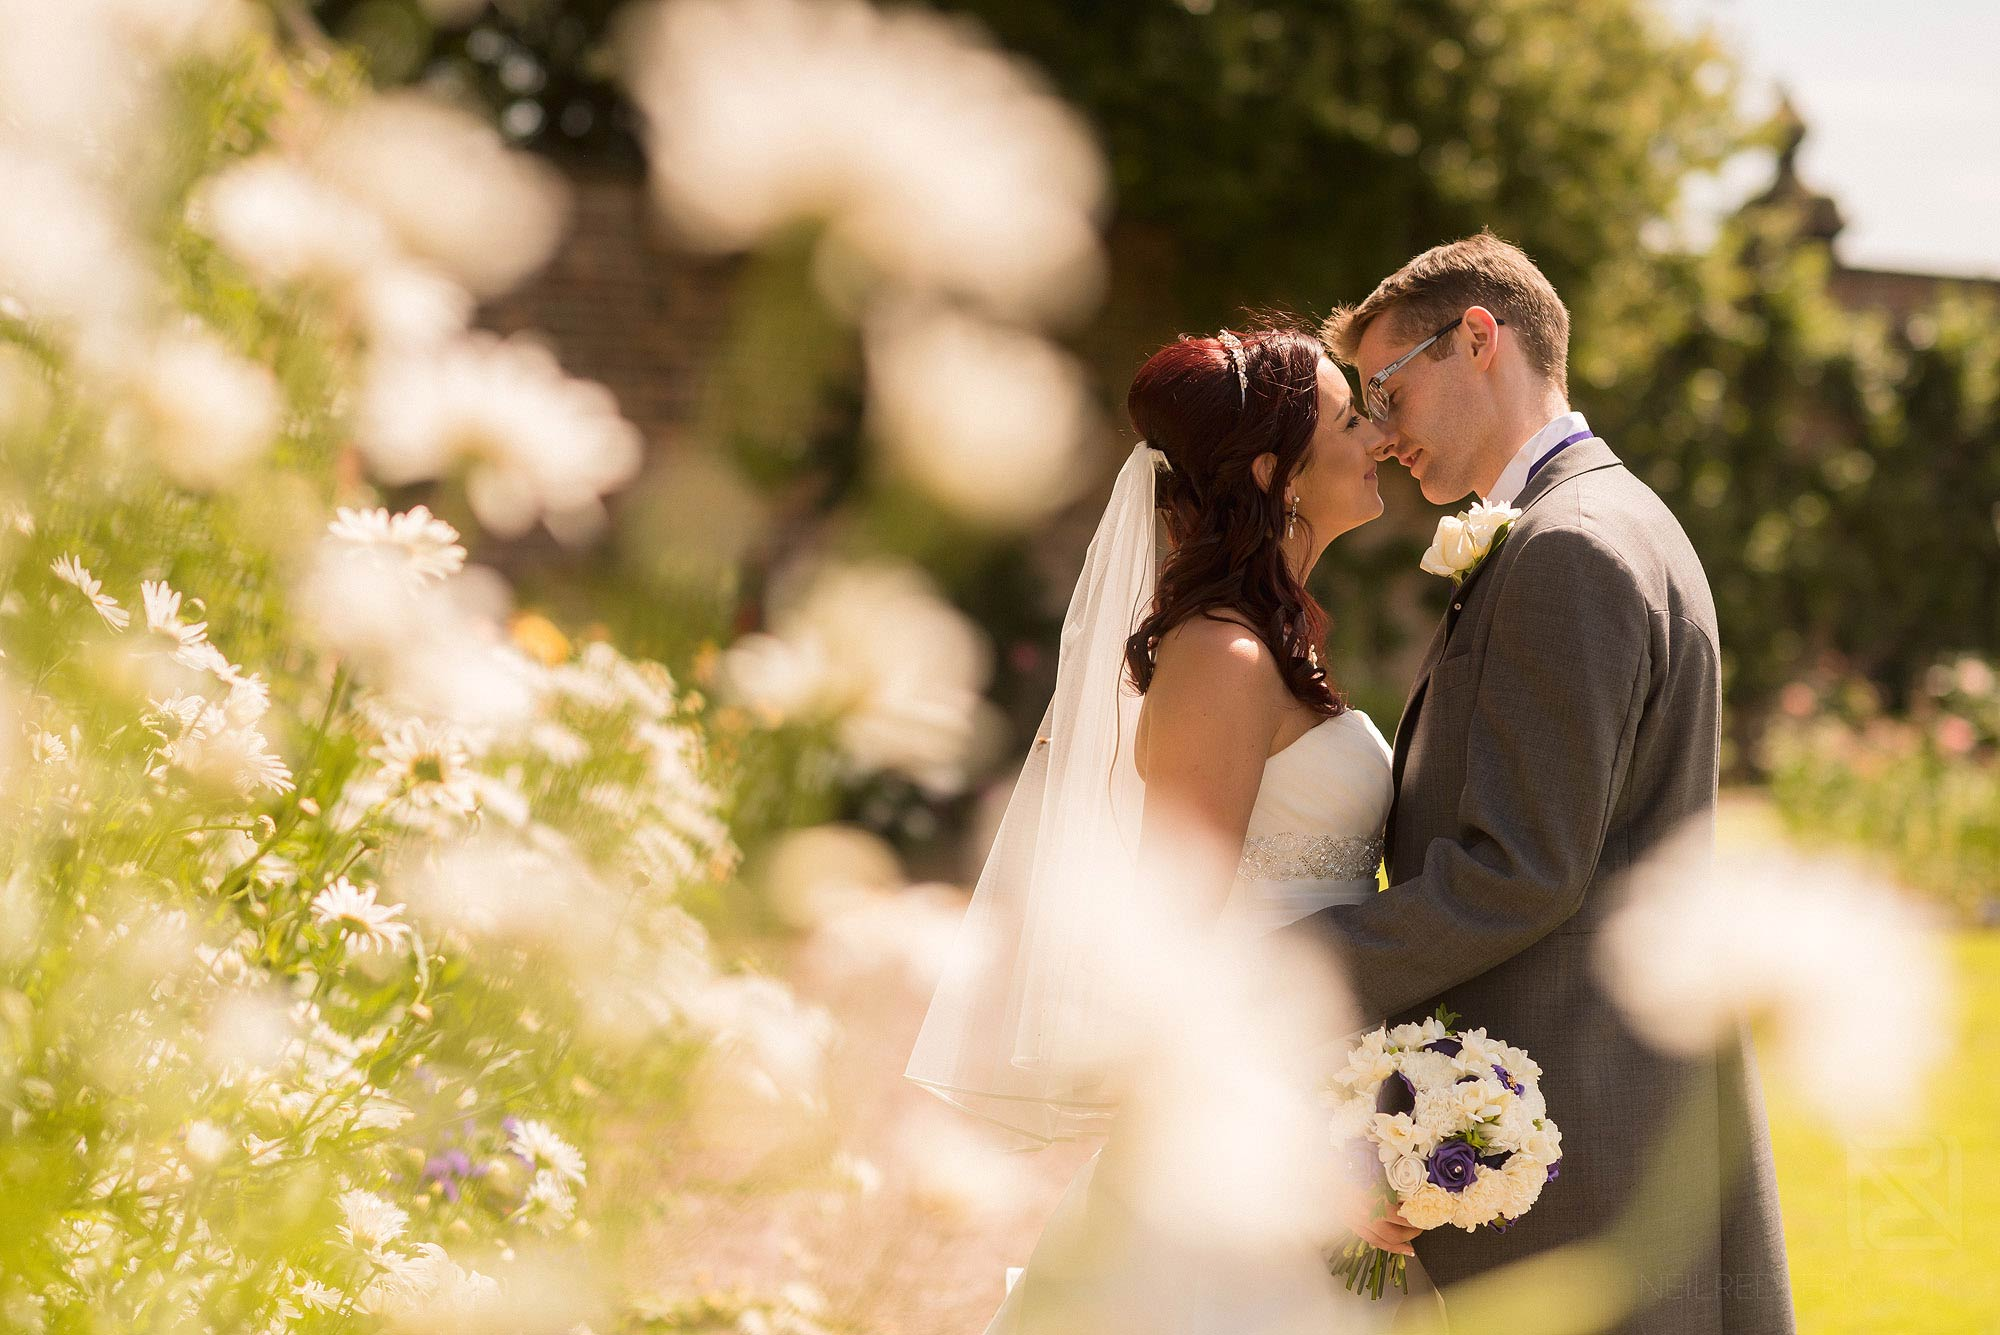 newlyweds kissing in Arley Hall gardens